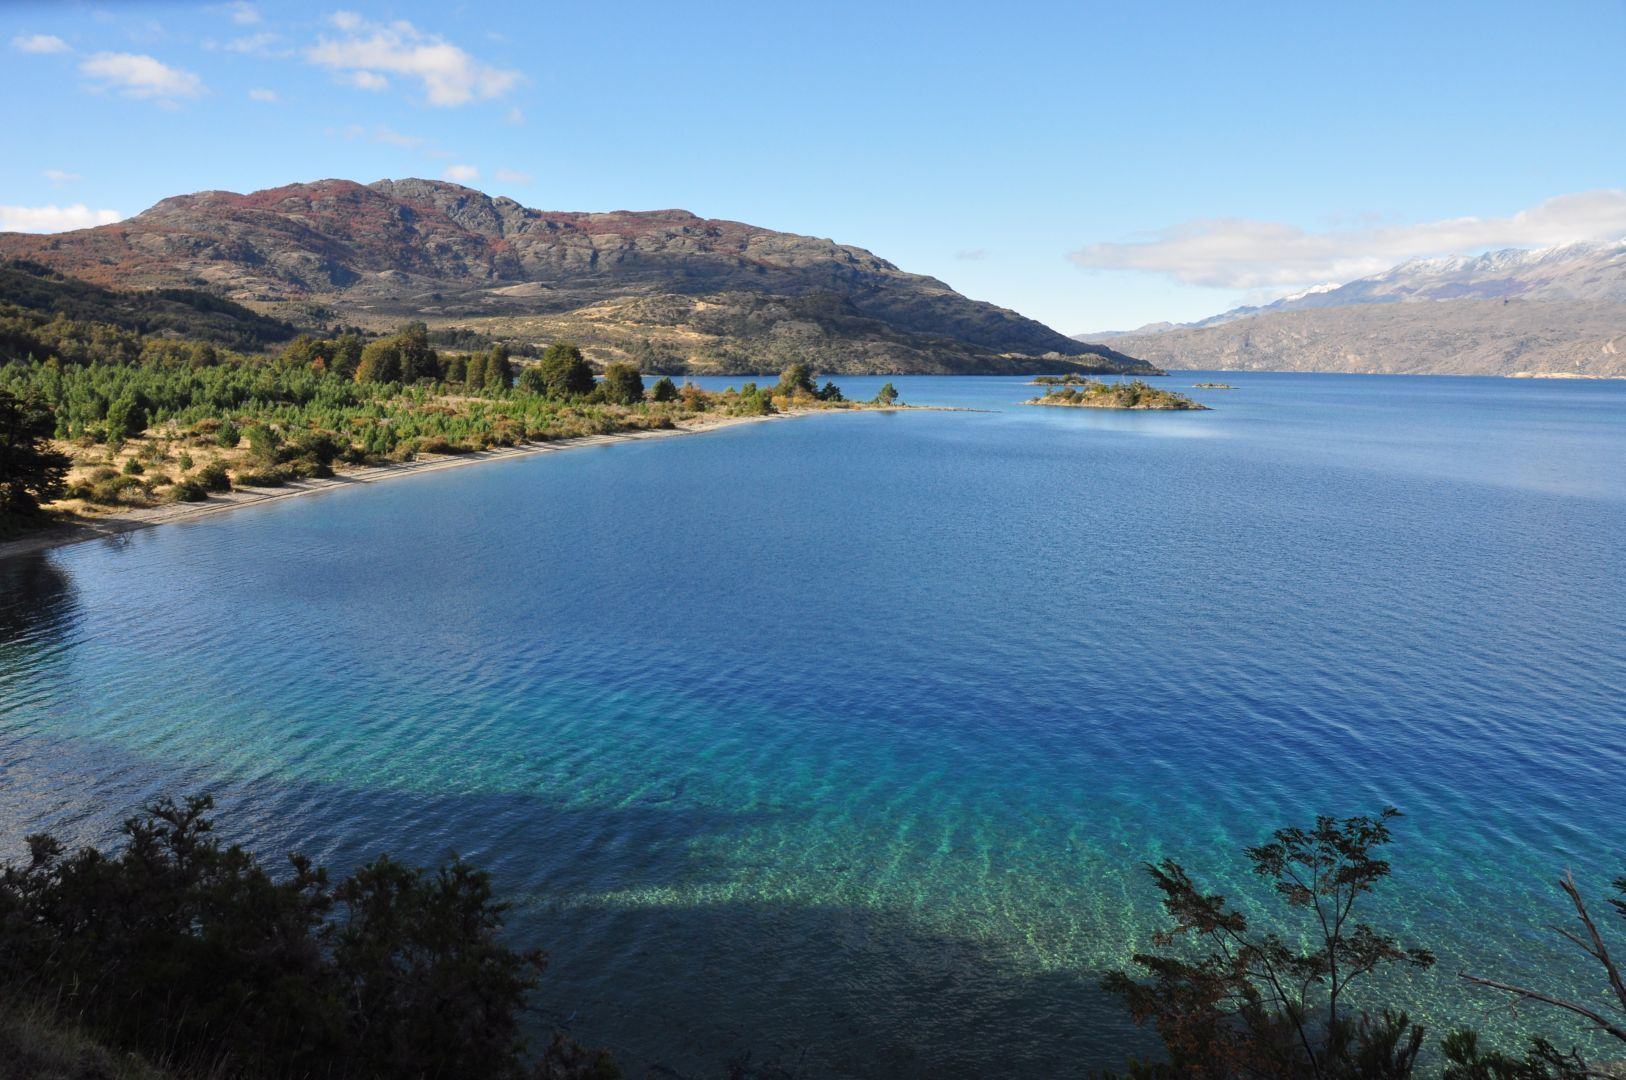 lago cochrane